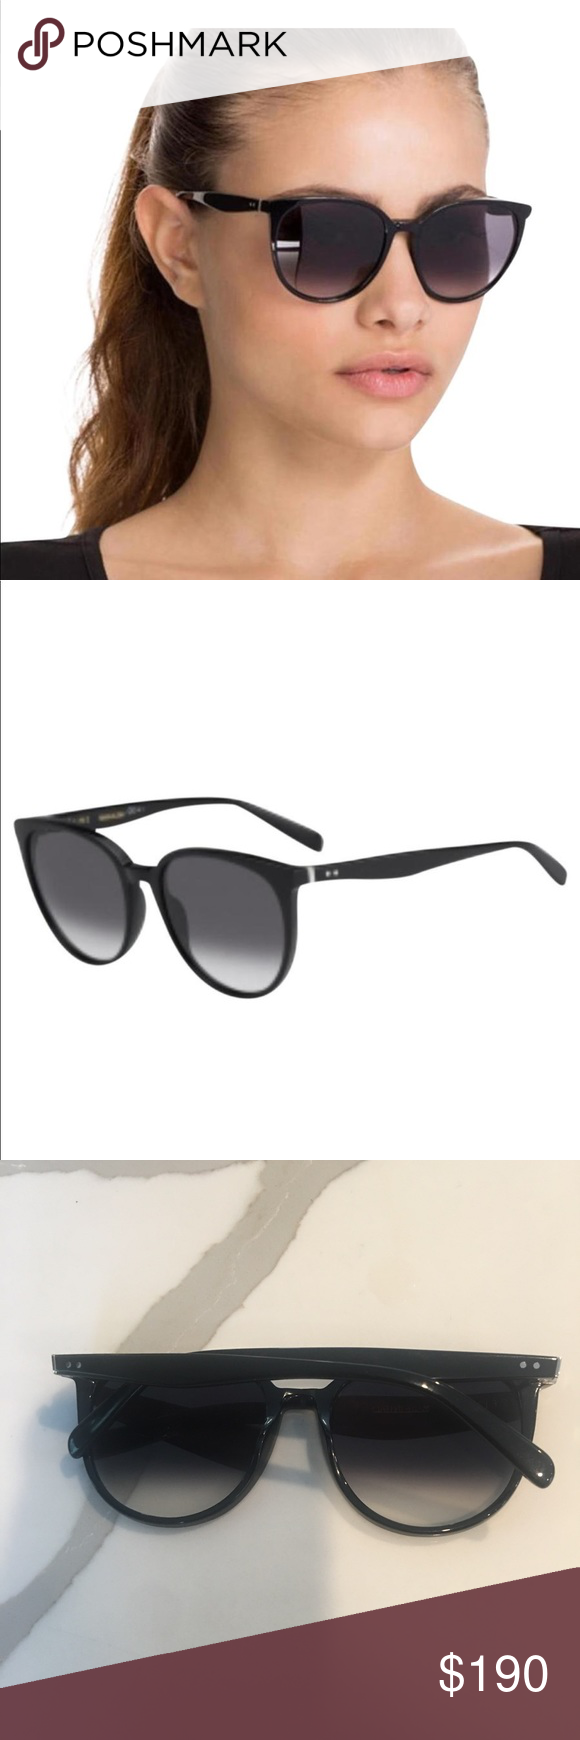 669858b0f2431 Celine sunglasses 👓👓👓👓👓👓 CL 41068 S 807W2 55 Celine Thin Mary ...